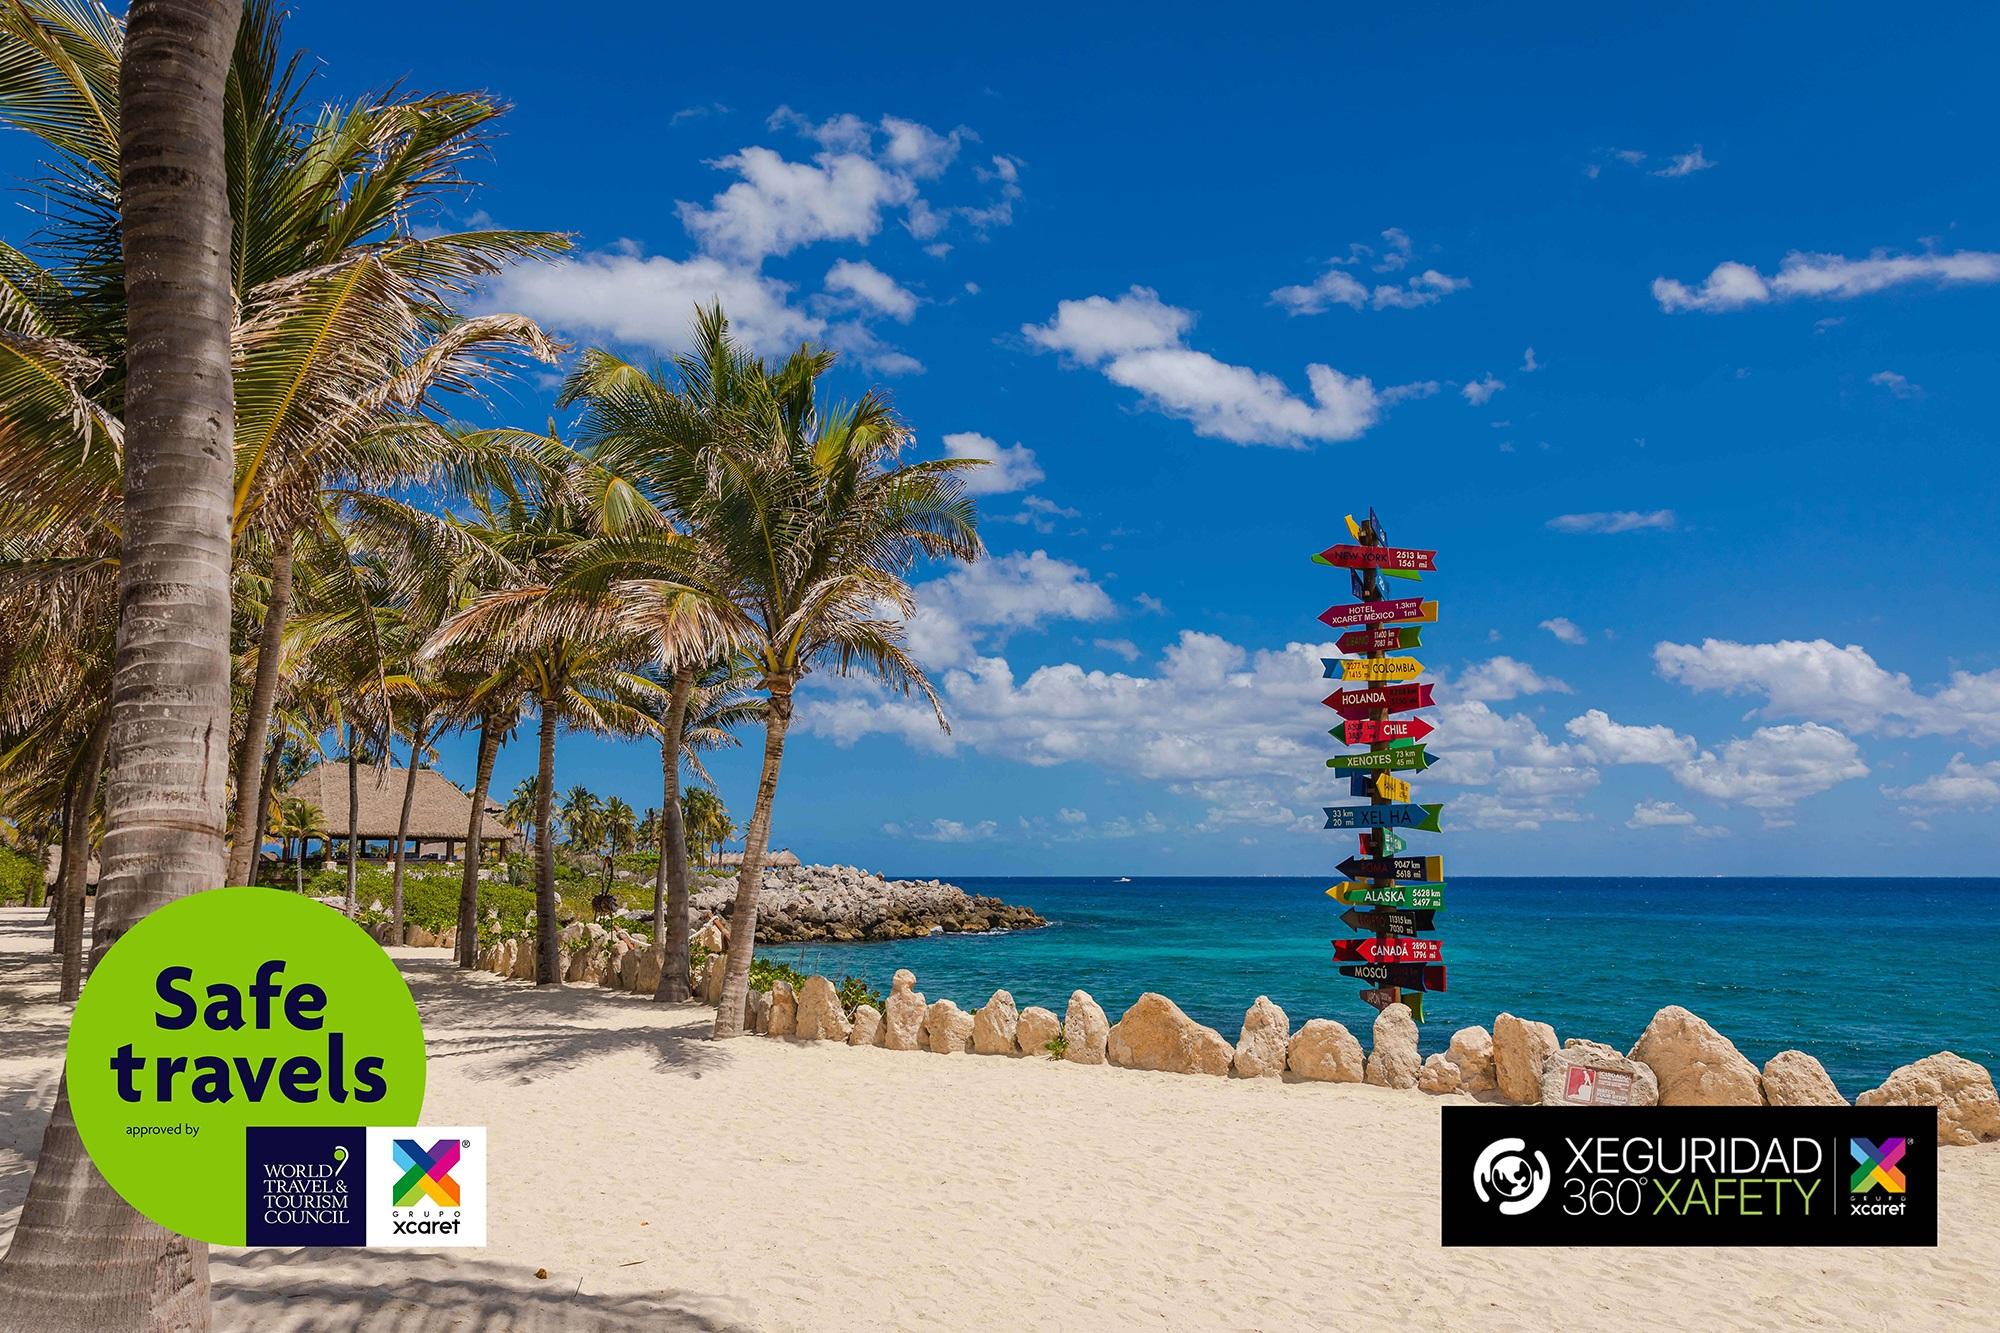 Maleta de Viajes, Hoteles, viajes, turismo, aventura, Xcaret, Quintana Roo, Notiviajeros